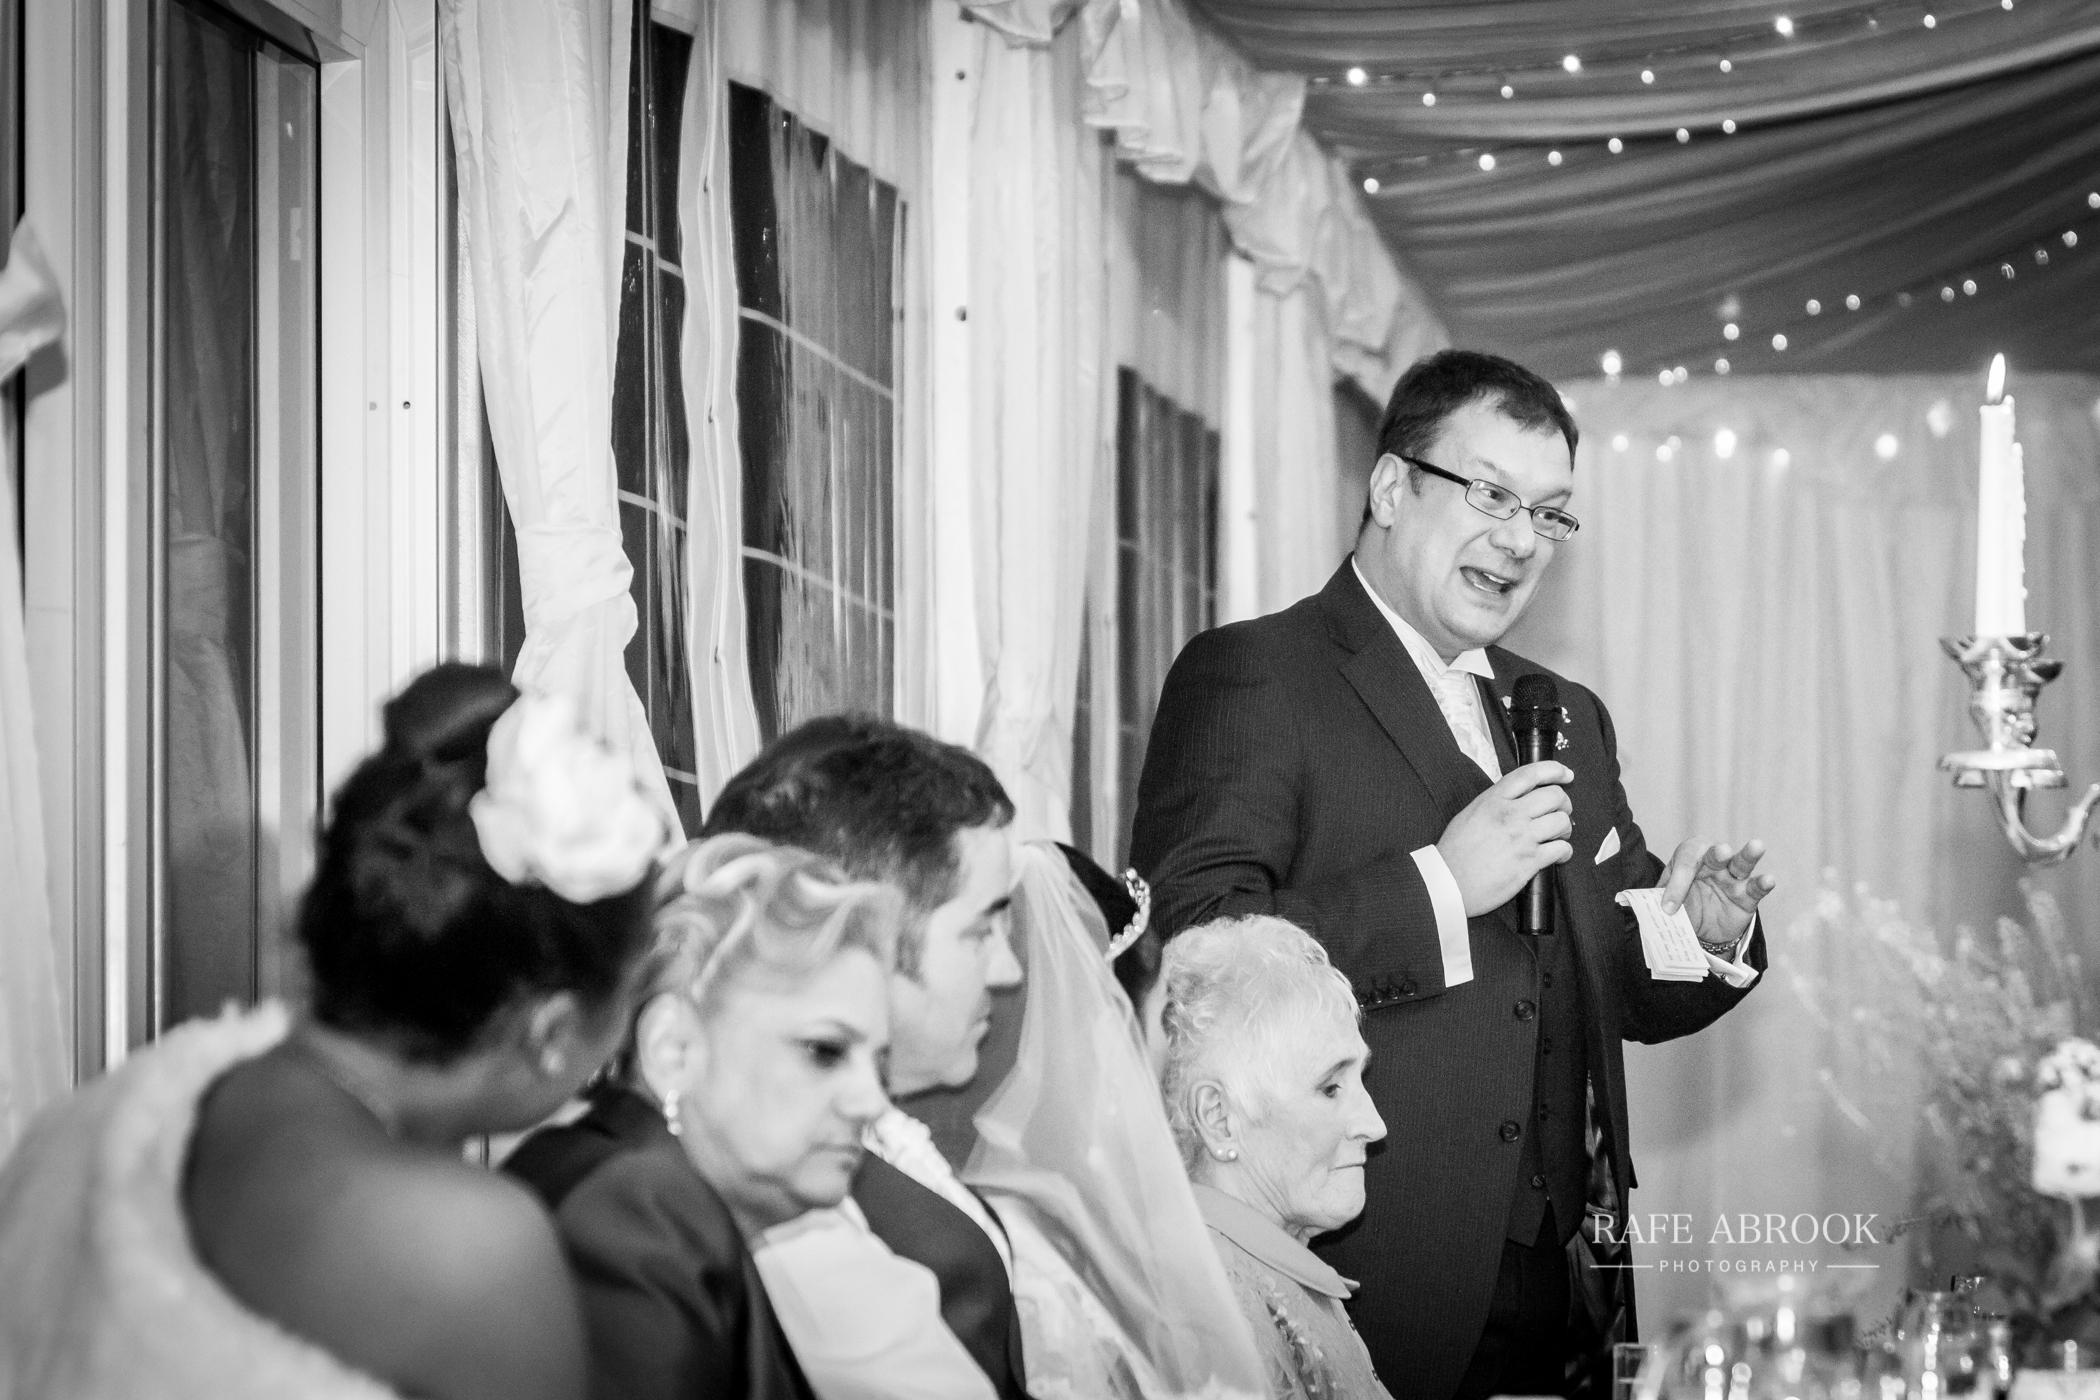 roma & pete wedding hampstead shenley hertfordshire -456.jpg